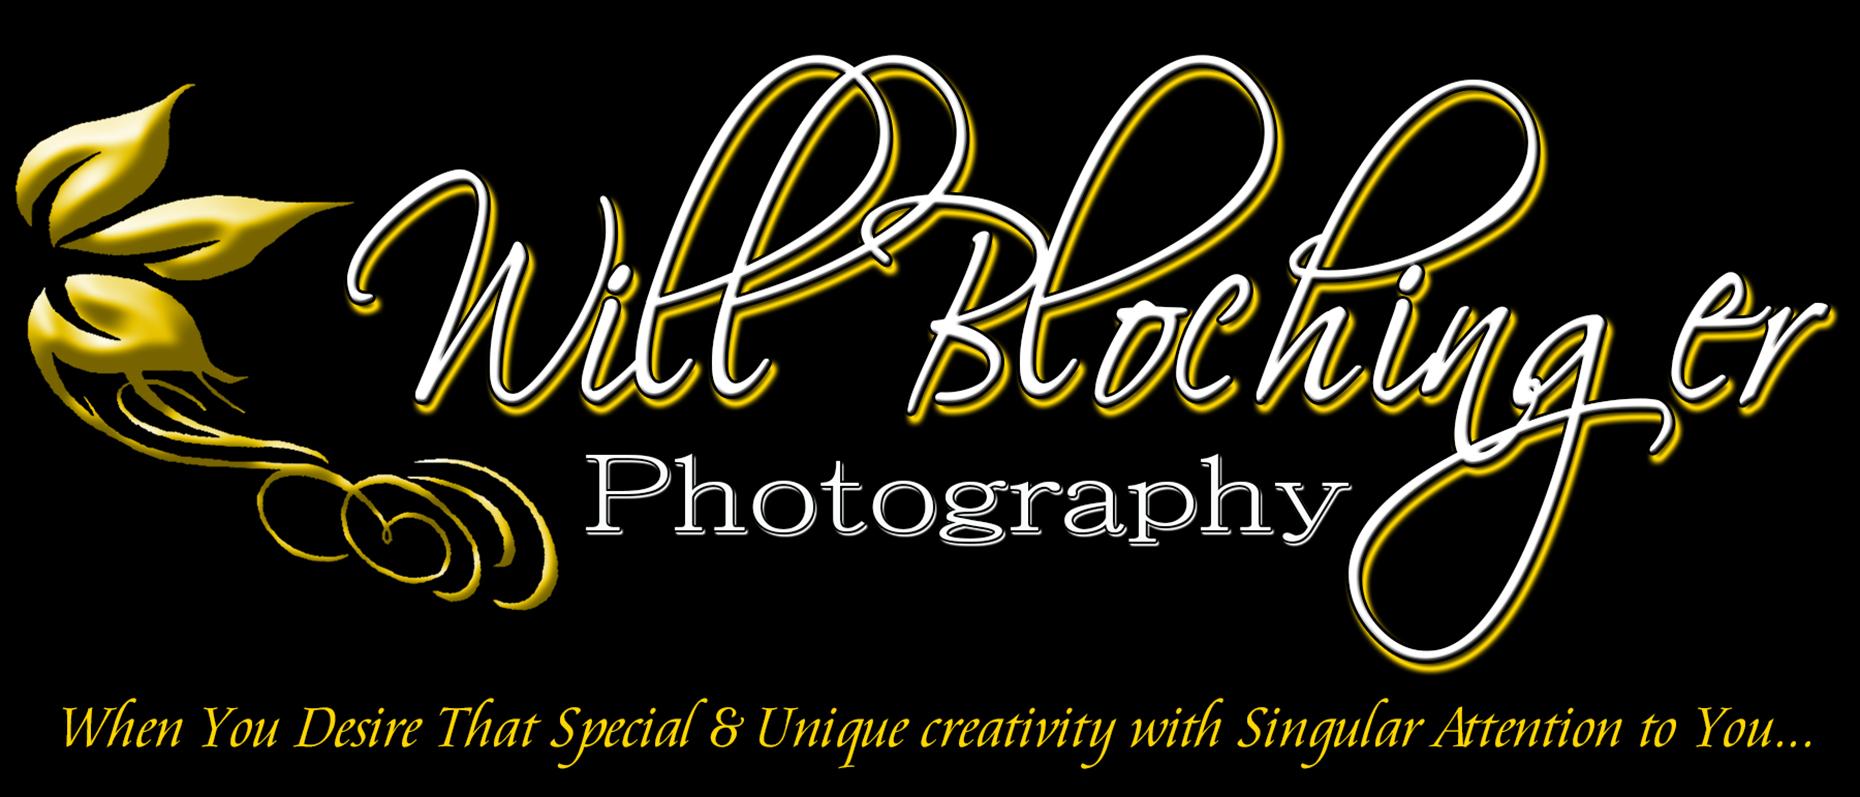 Will Blochinger Wedding Photography